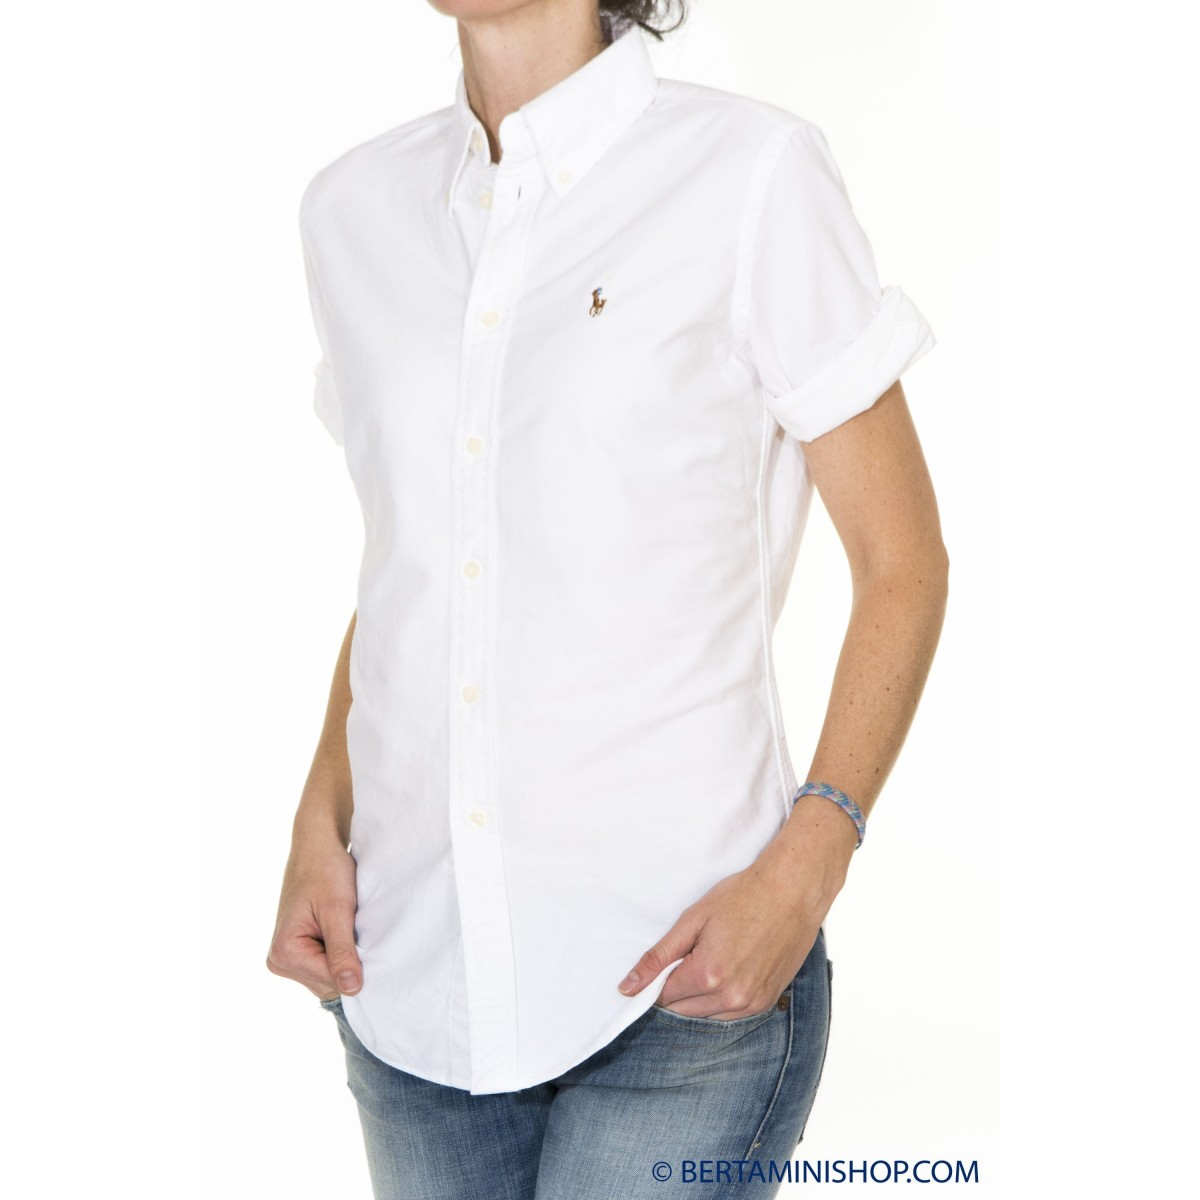 Hemd Ralph Lauren Damen  - V33Ih843Bh843 B11D1 - Bianco